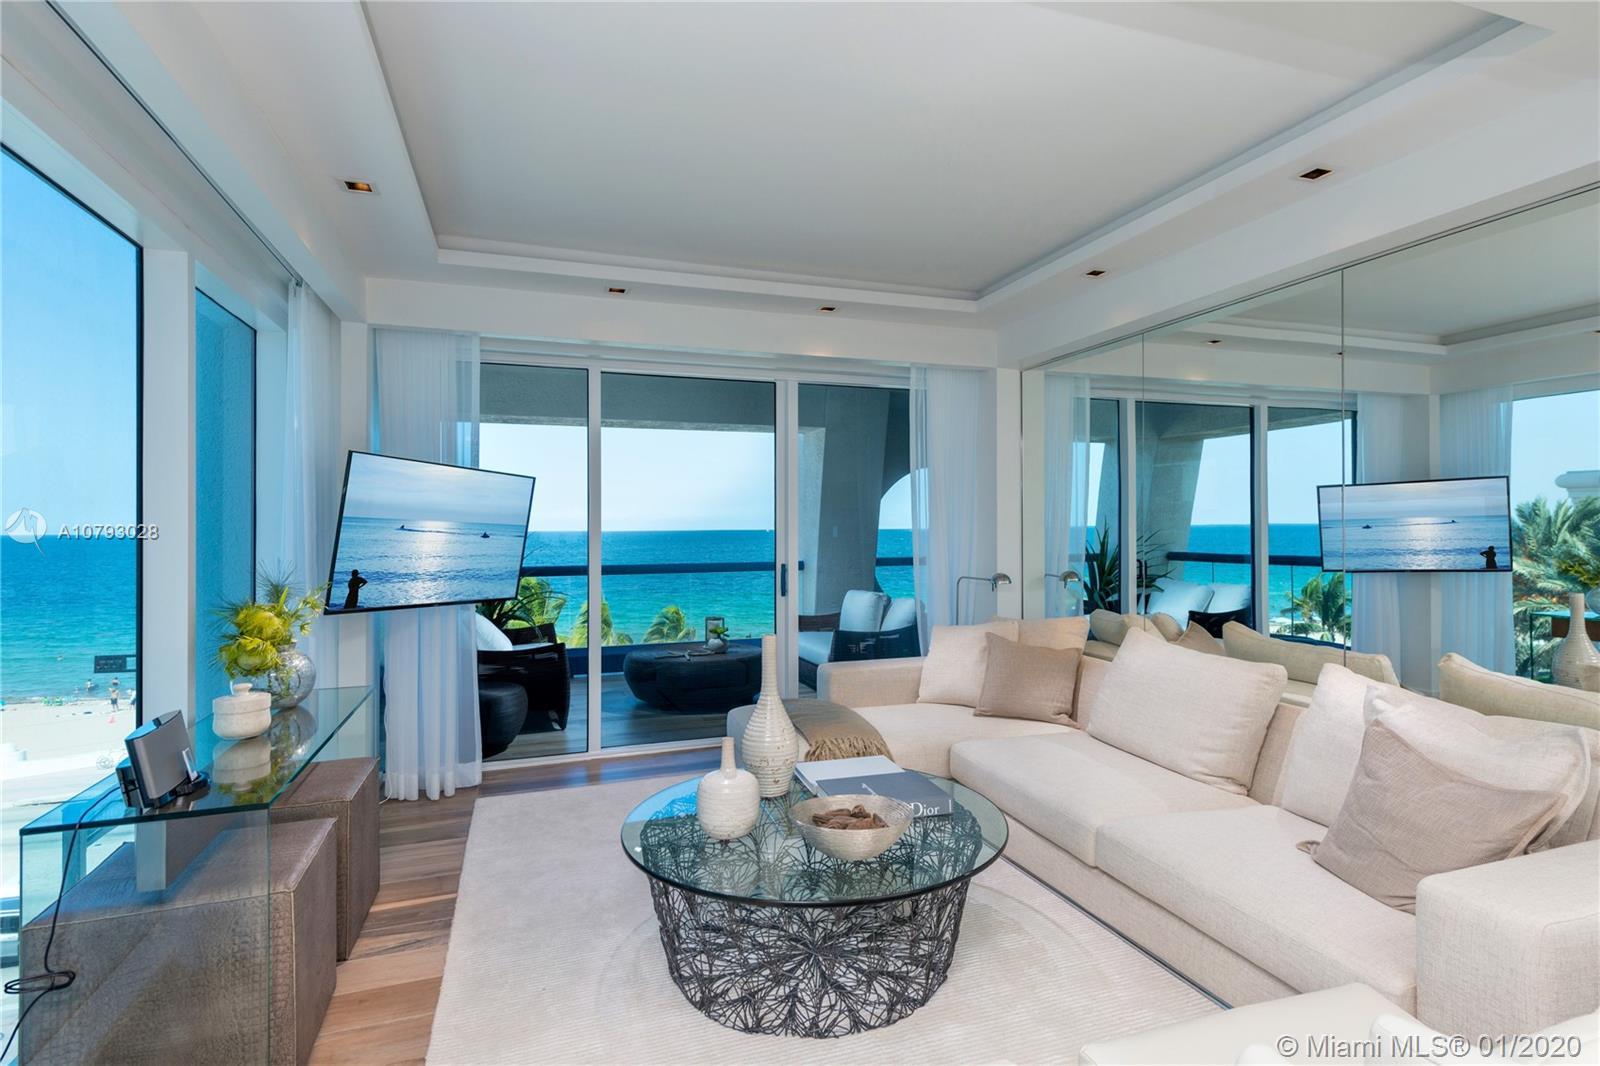 551 N Fort Lauderdale Beach Blvd 301, Hallandale Beach, FL 33304